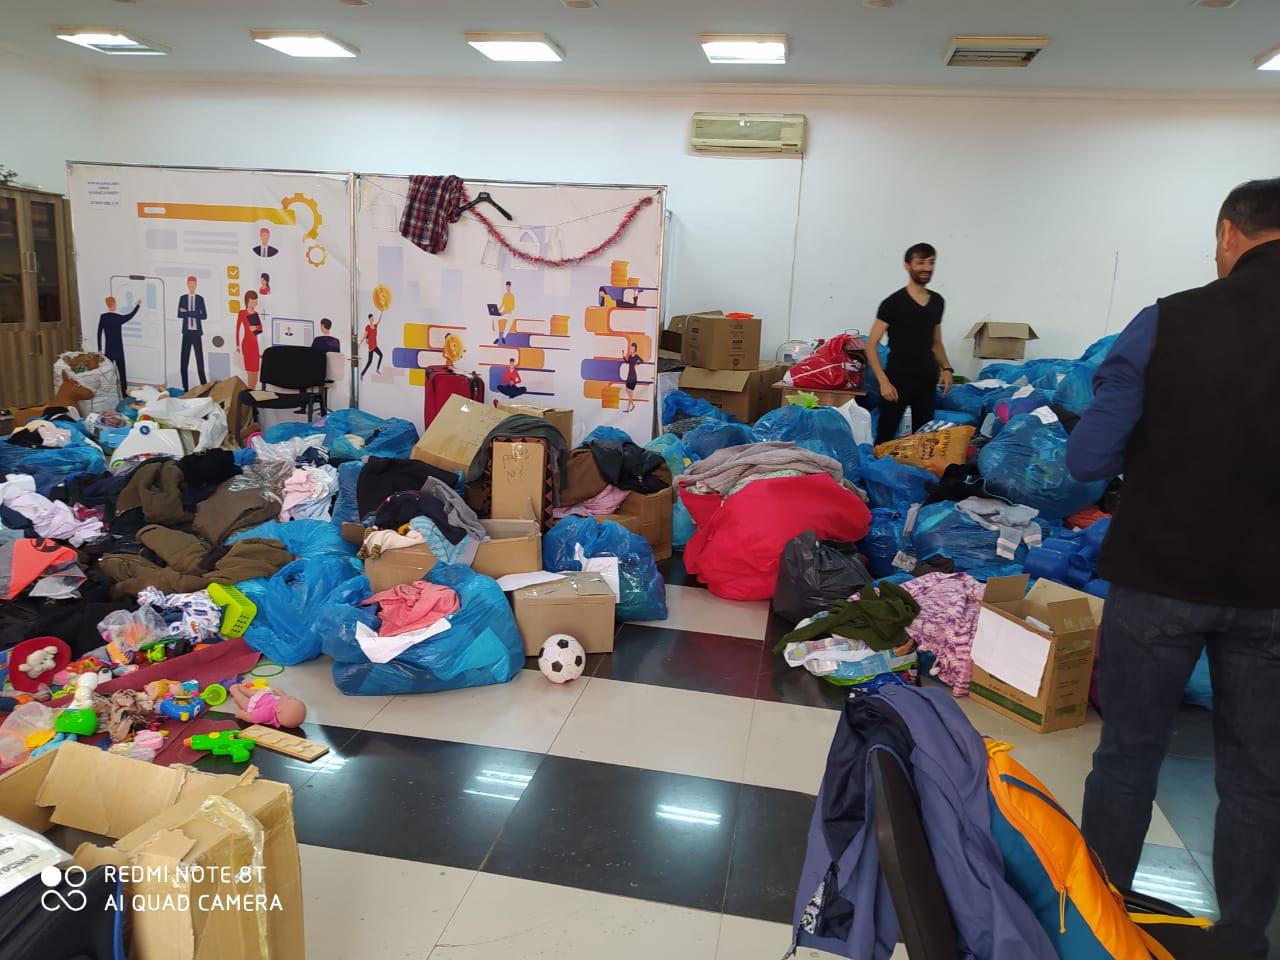 Пожертвования для перемещённых семей. Фото: Санубар Гейдарова.